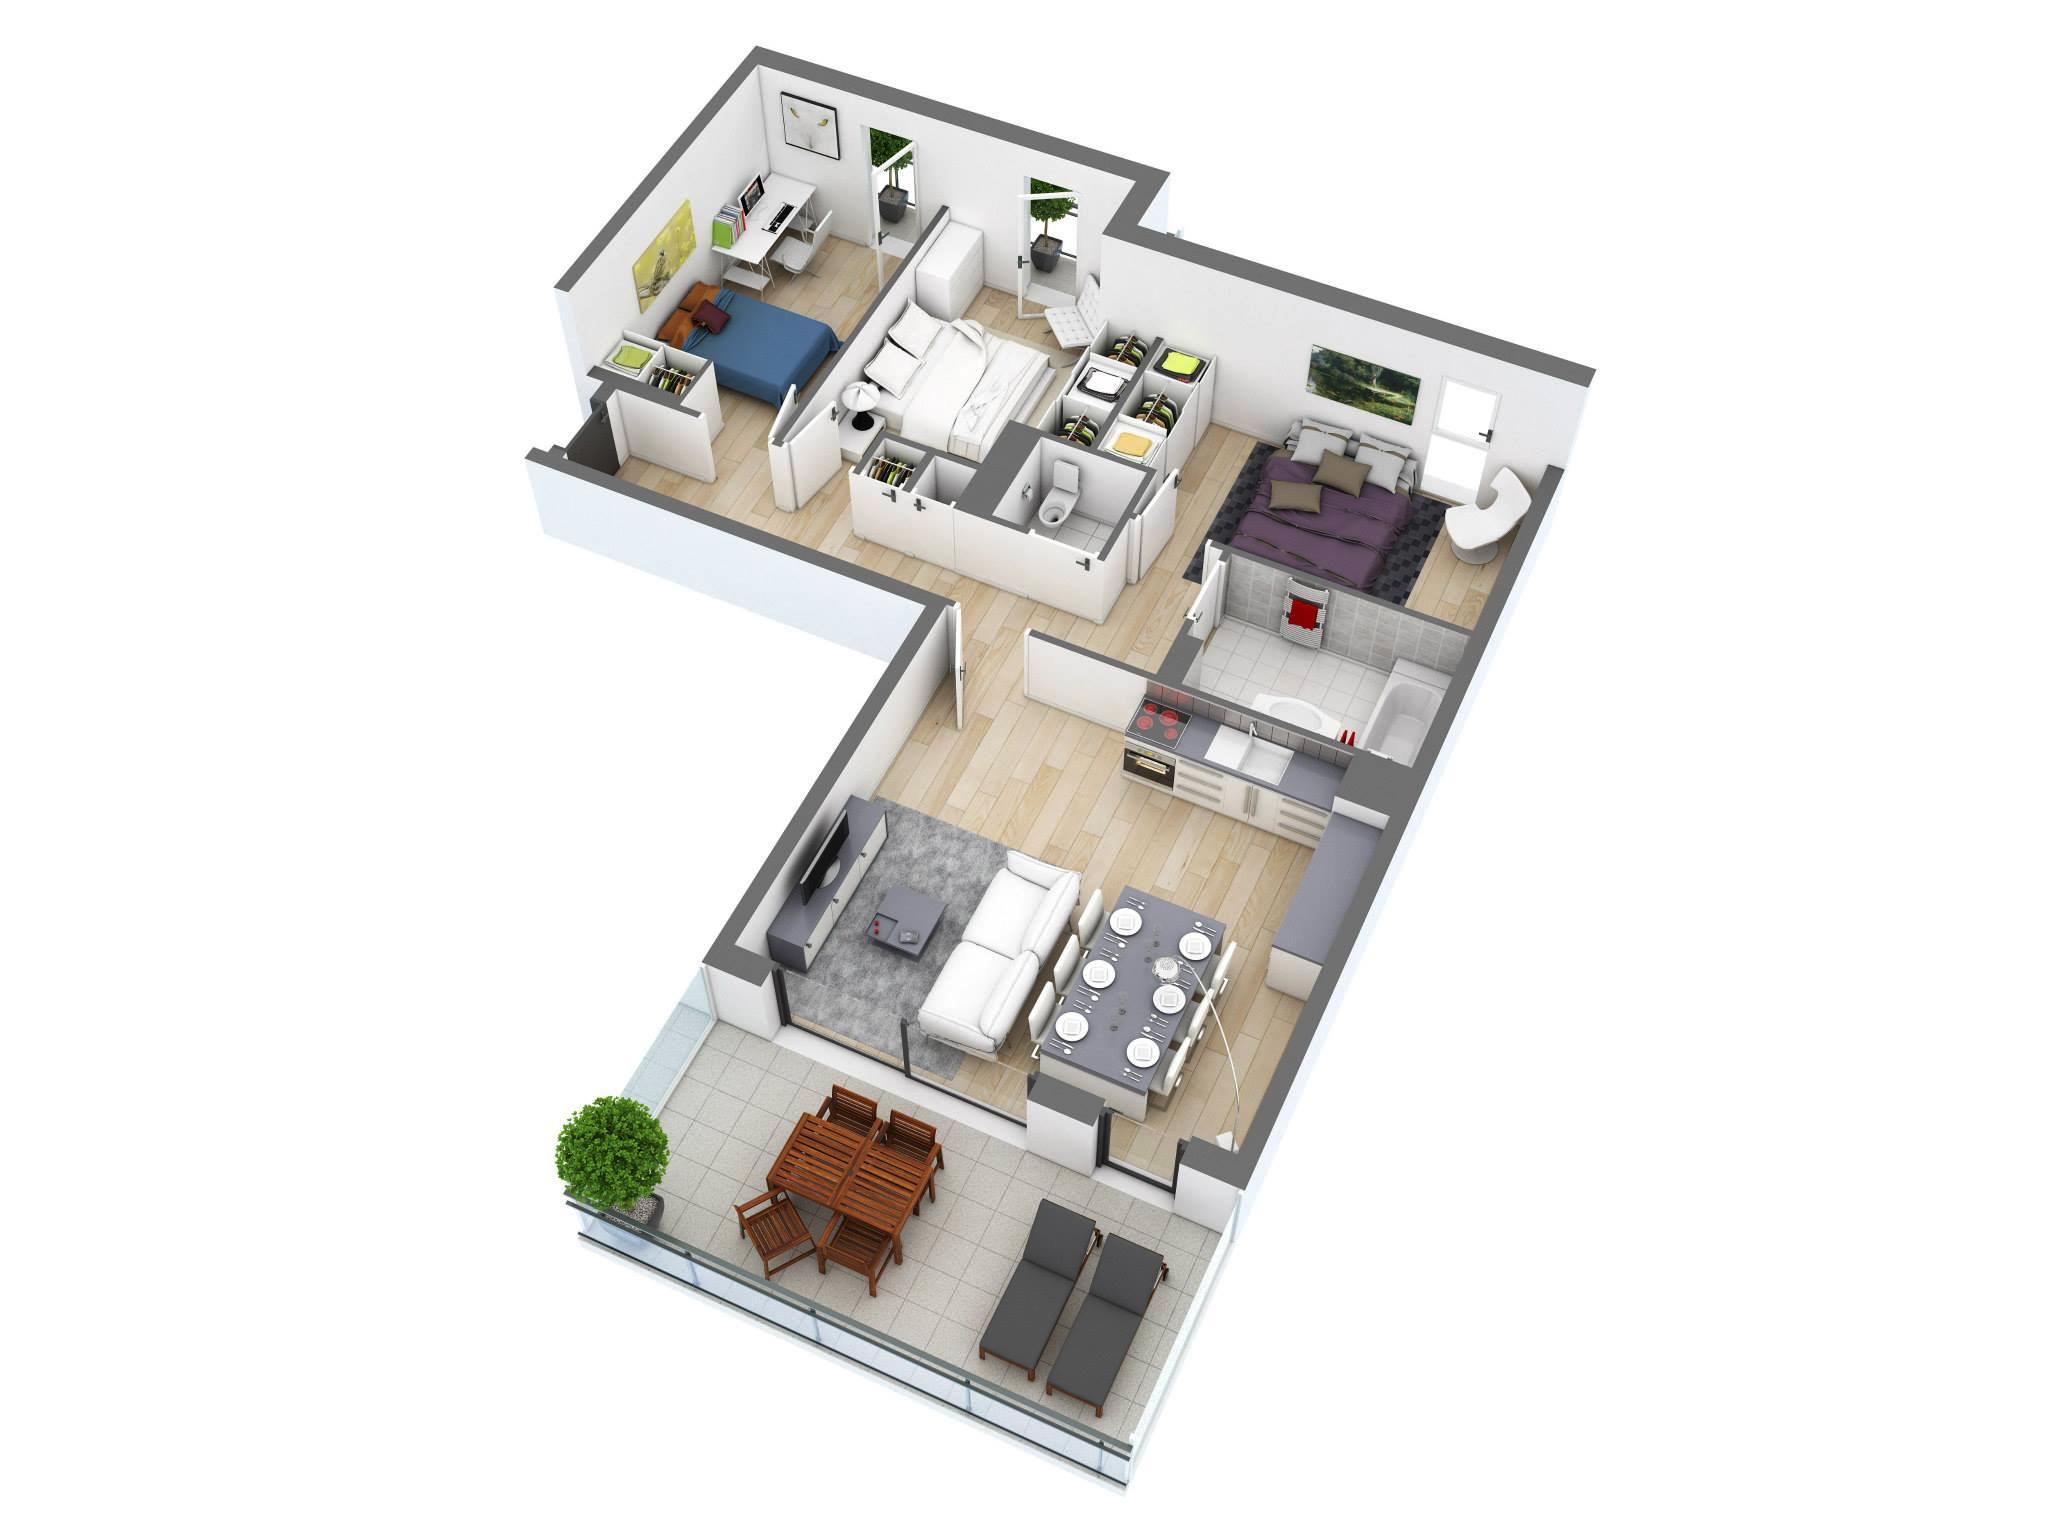 Drawn bedroom 3d classroom 3D & Architecture Bedroom 25